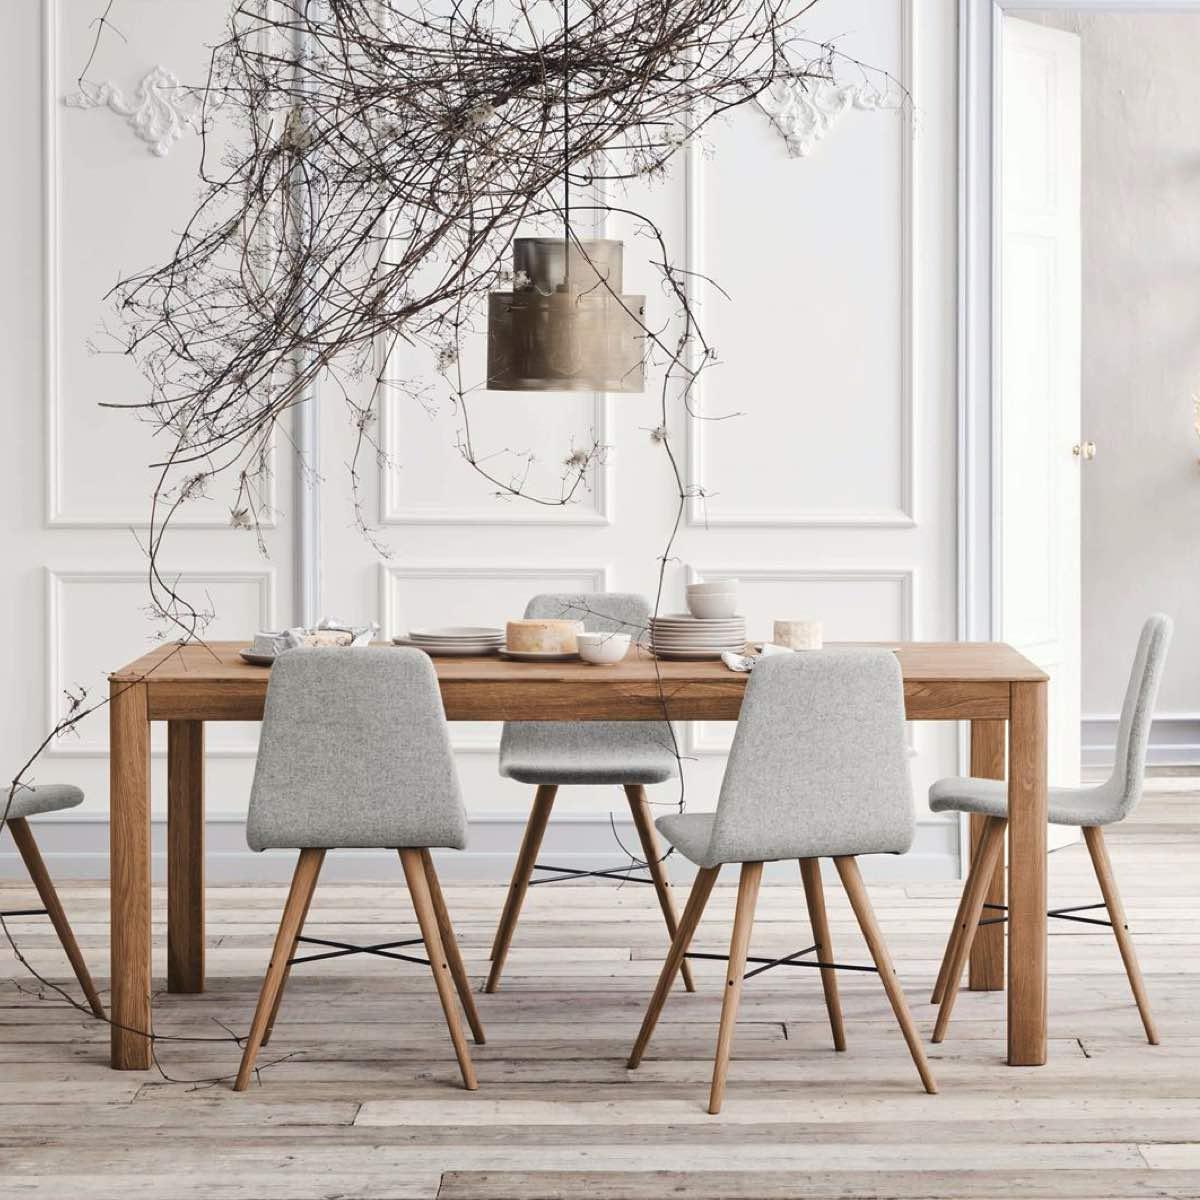 Bolia tafels Ninove